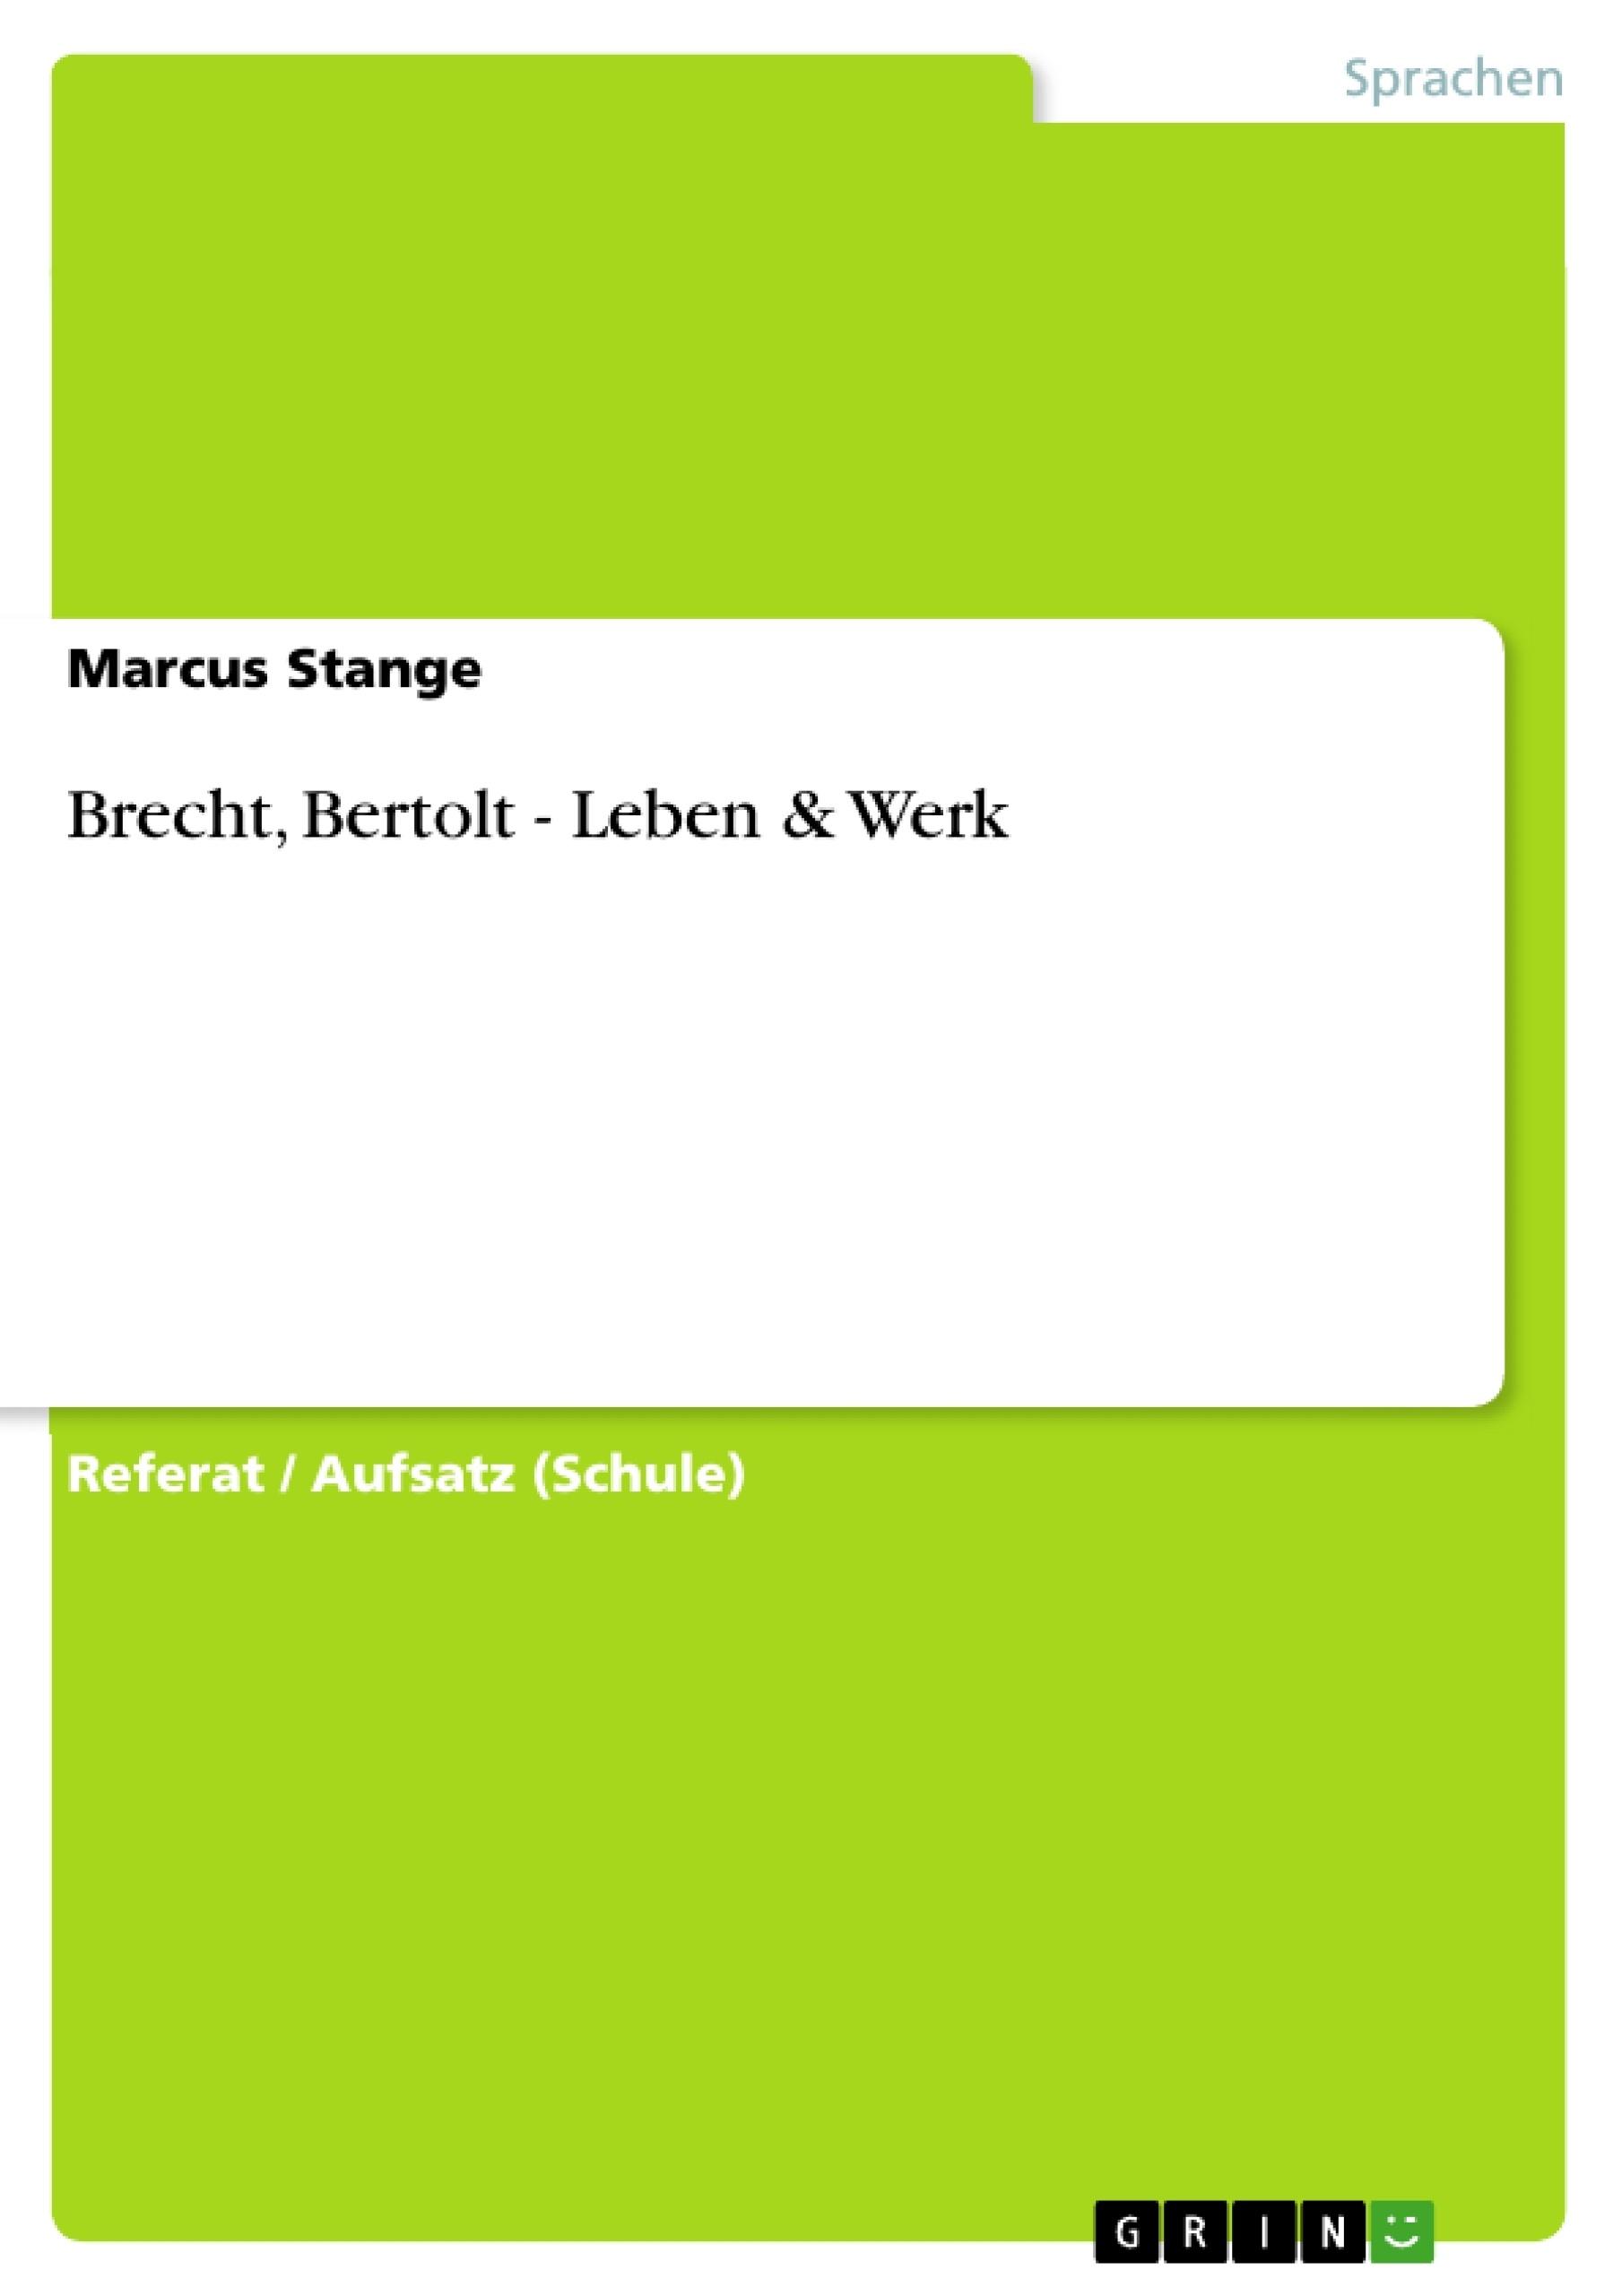 Titel: Brecht, Bertolt - Leben & Werk